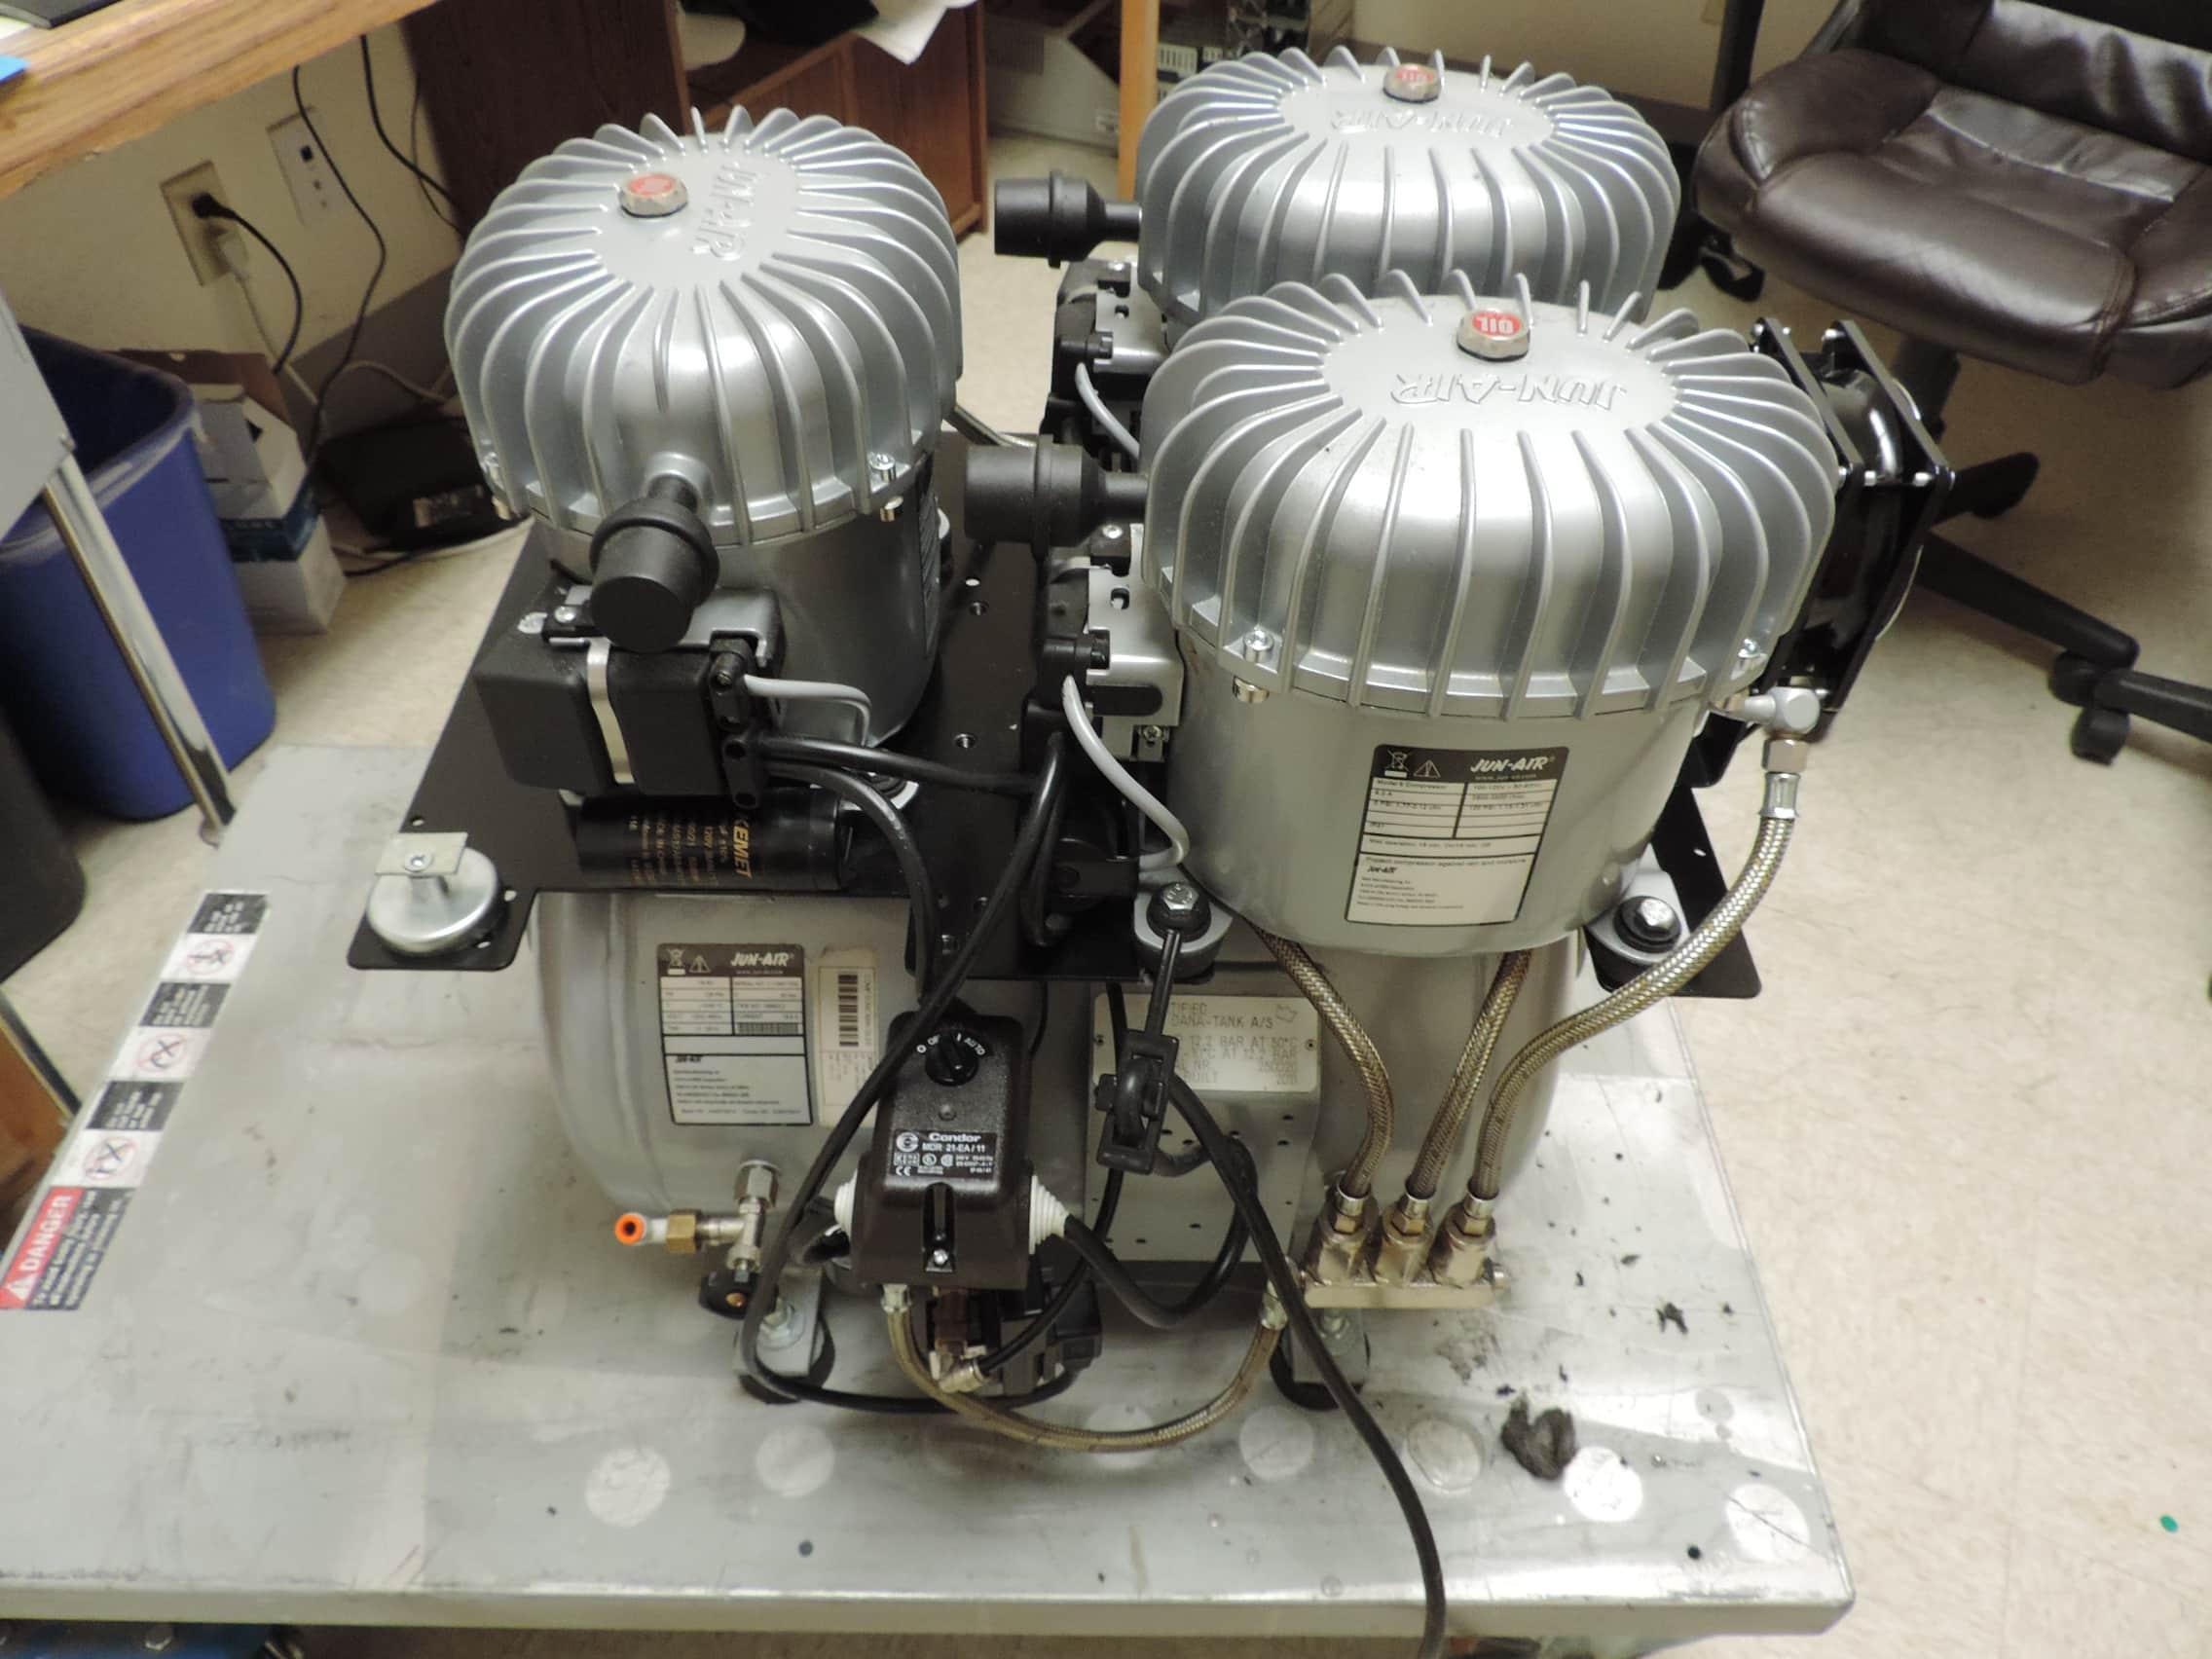 Jun-Air™ 18-40 Quiet Oiled Laboratory Air Compressor